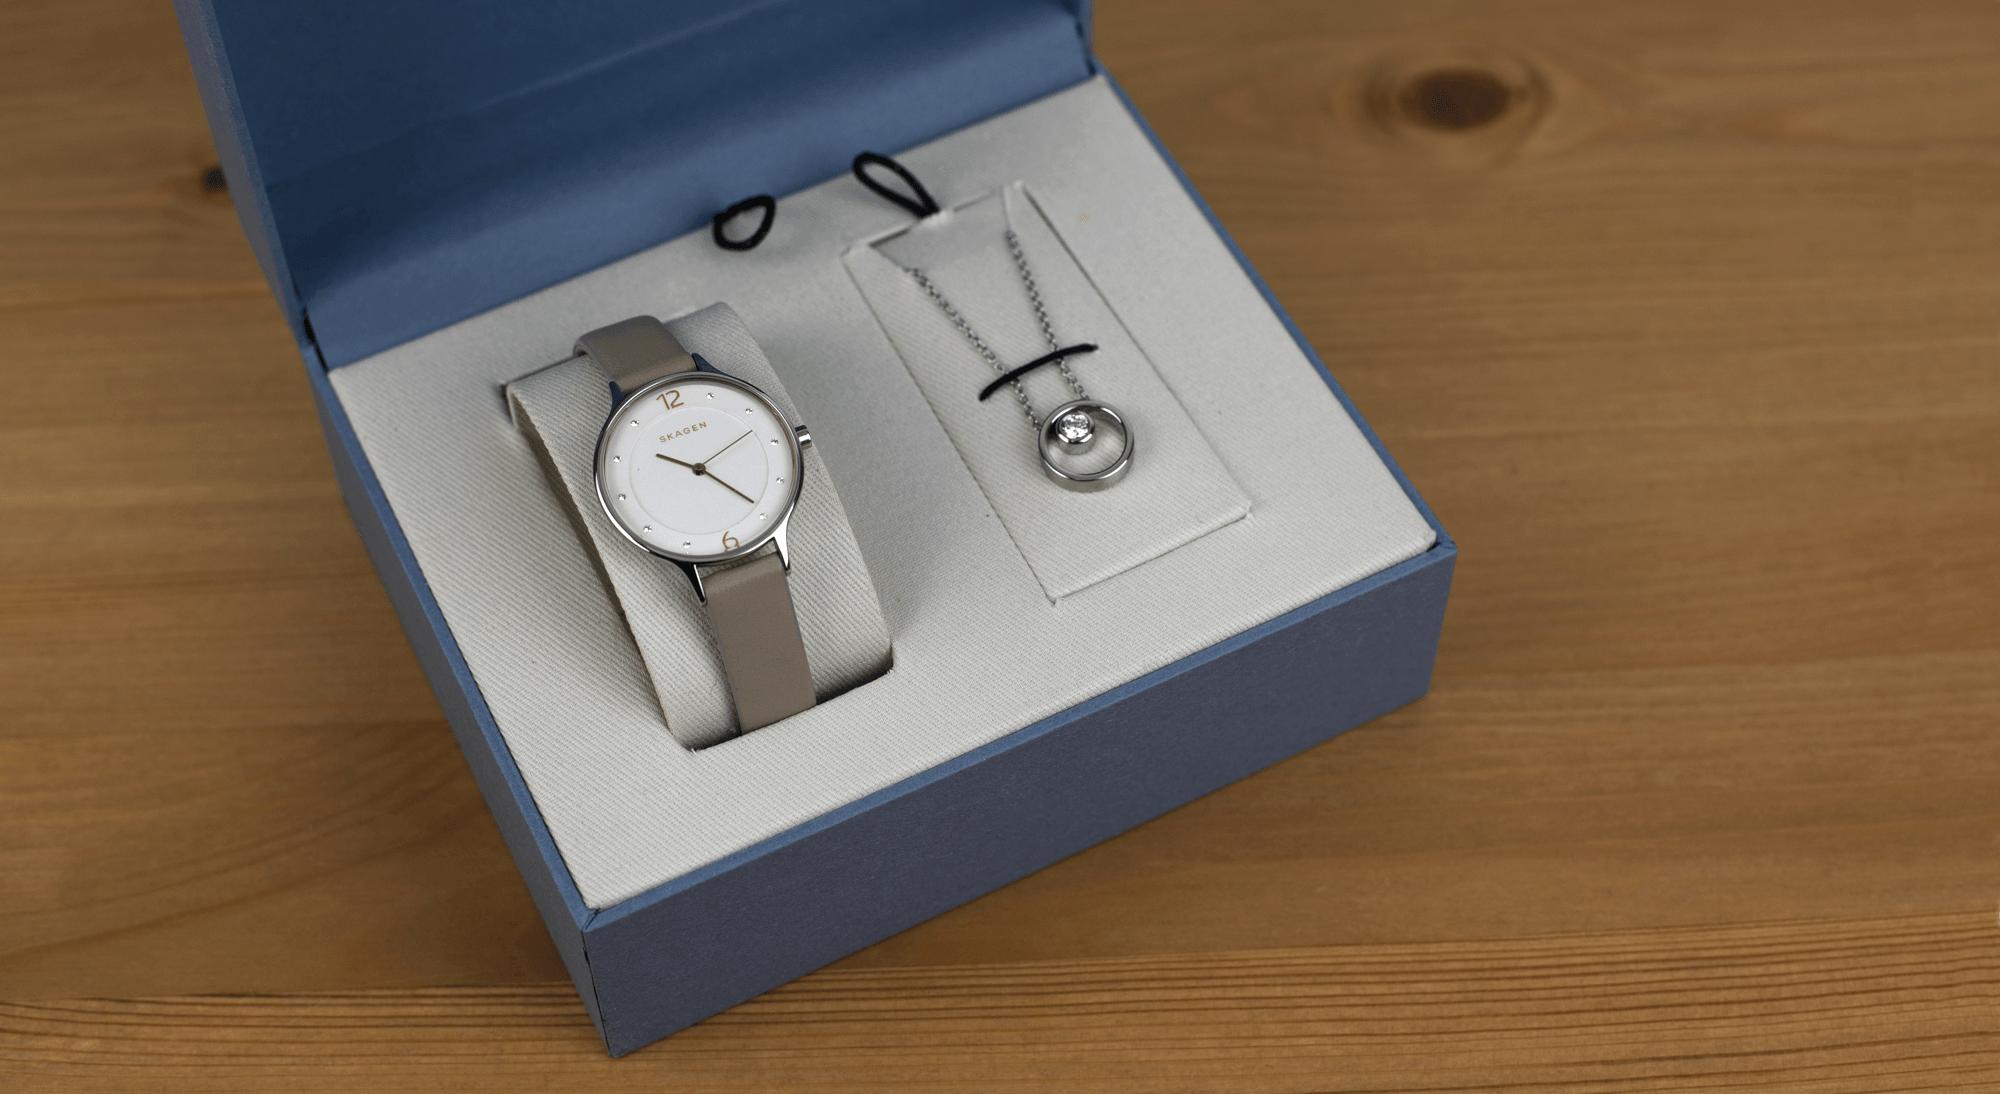 Skagen SKW1100 watch and necklace gift set